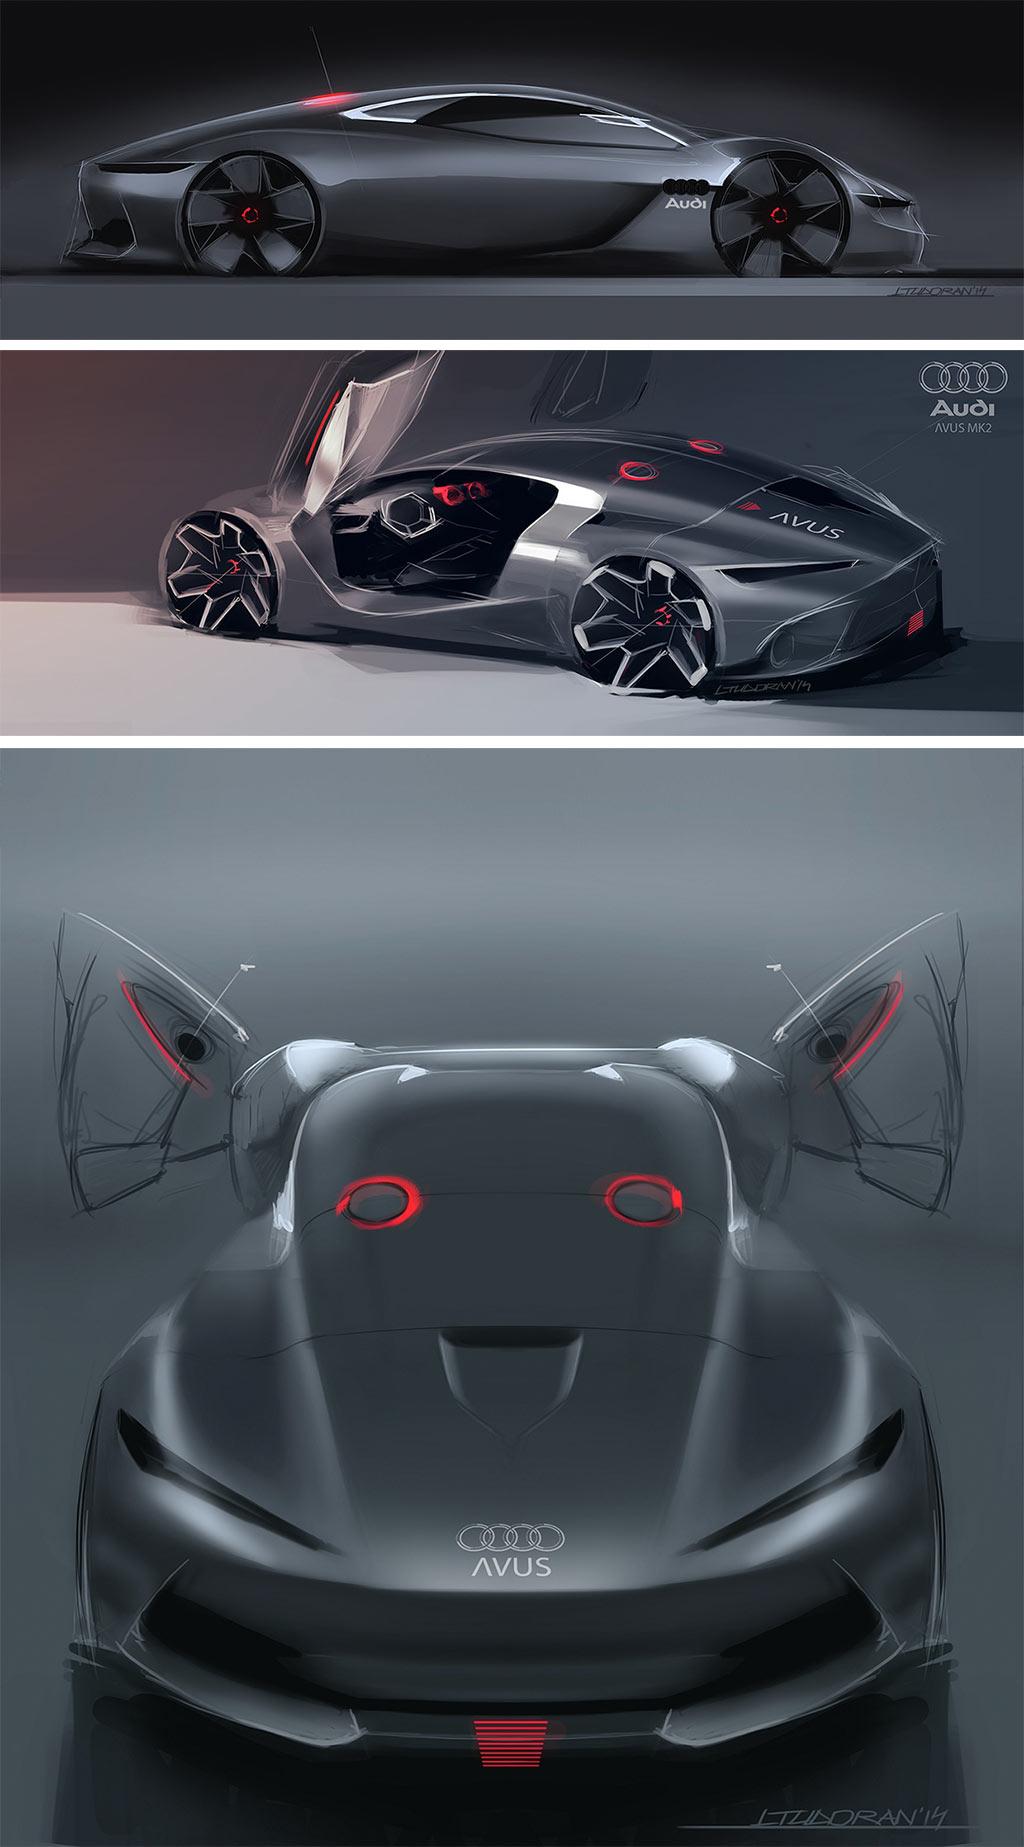 Audi Avus Mkii Concept Design Sketches By Liviu Tudoran